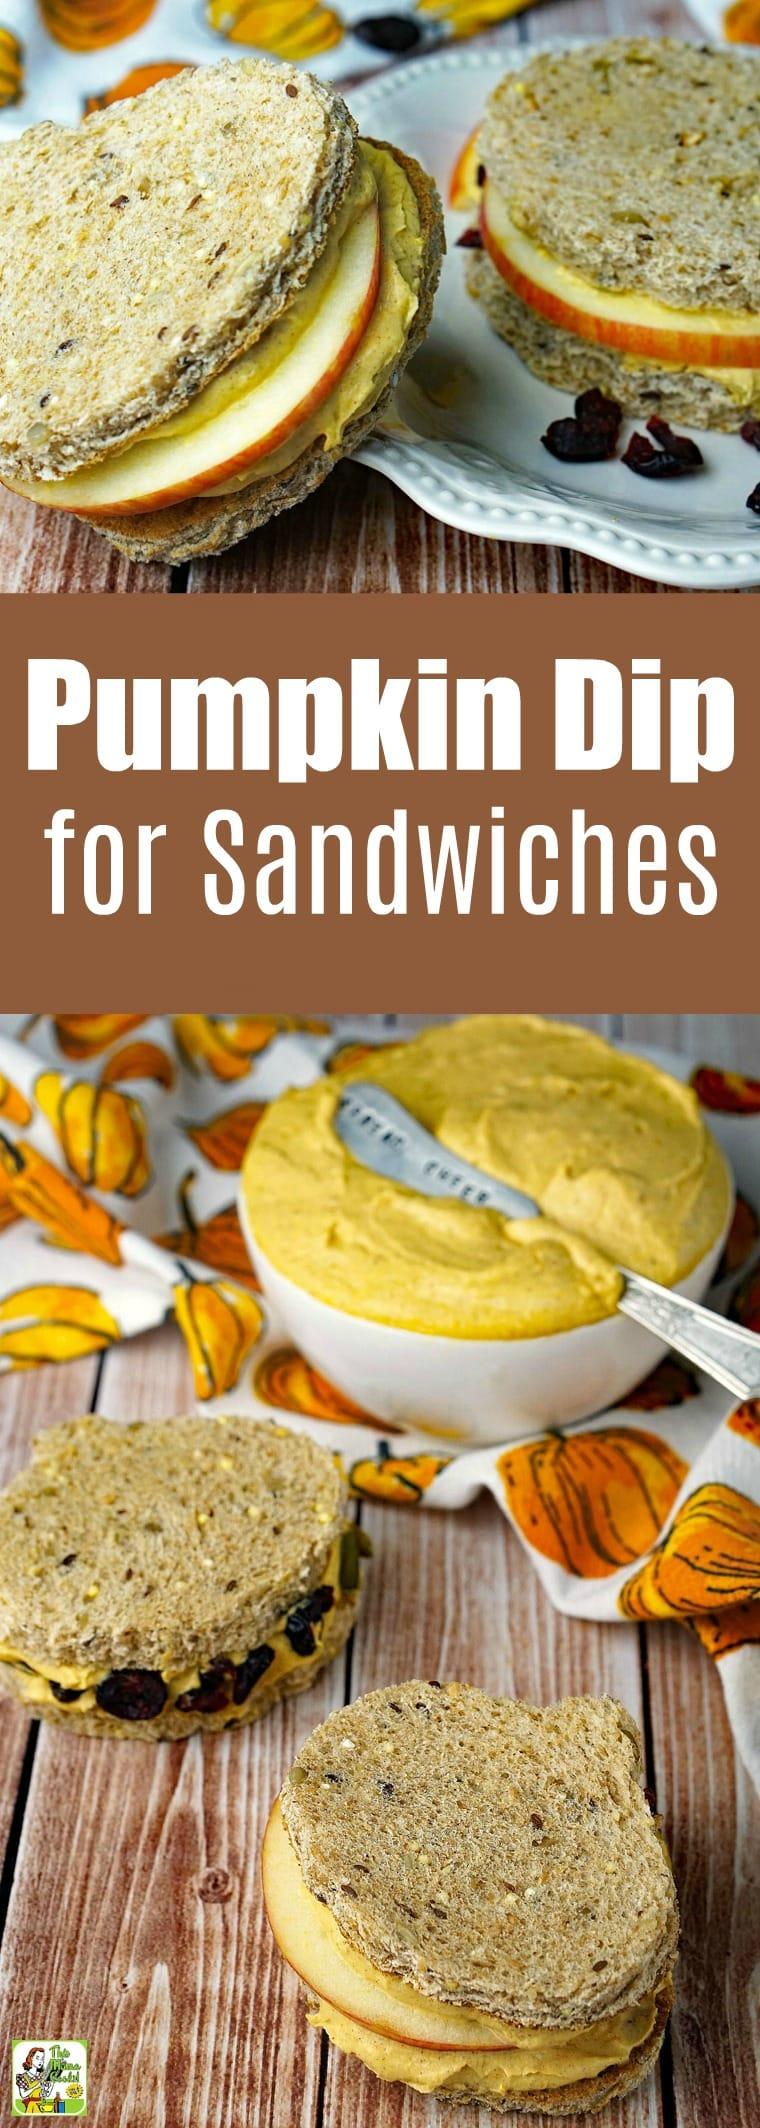 Pumpkin Dip Recipe for Sandwiches